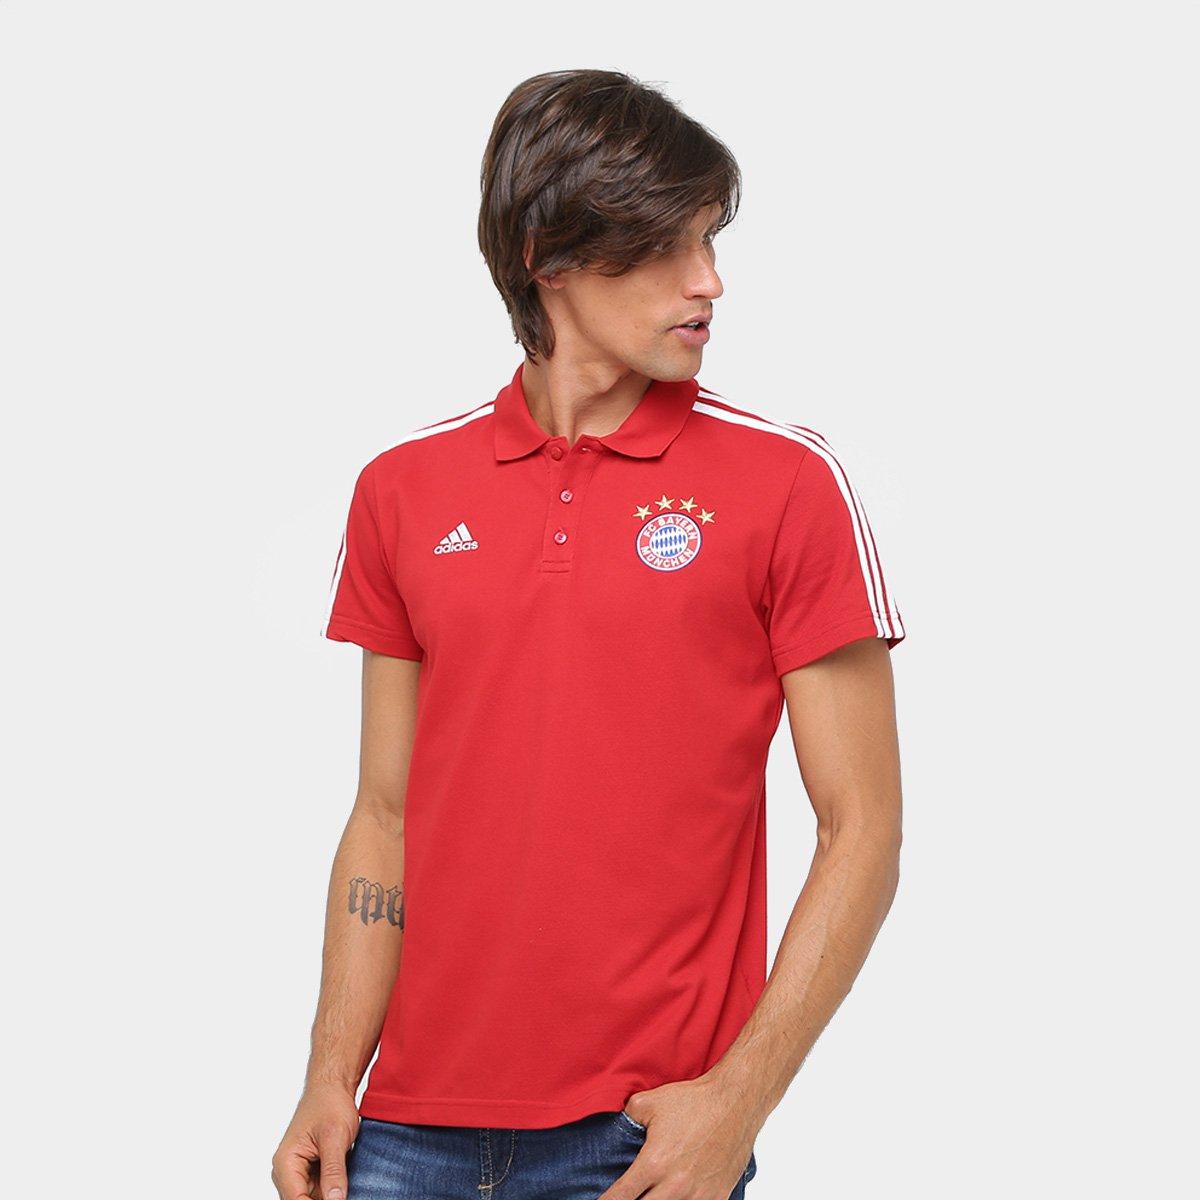 Camisa Polo Bayern de Munique Adidas 3S Masculina - Compre Agora ... b3b8ccae99cd9